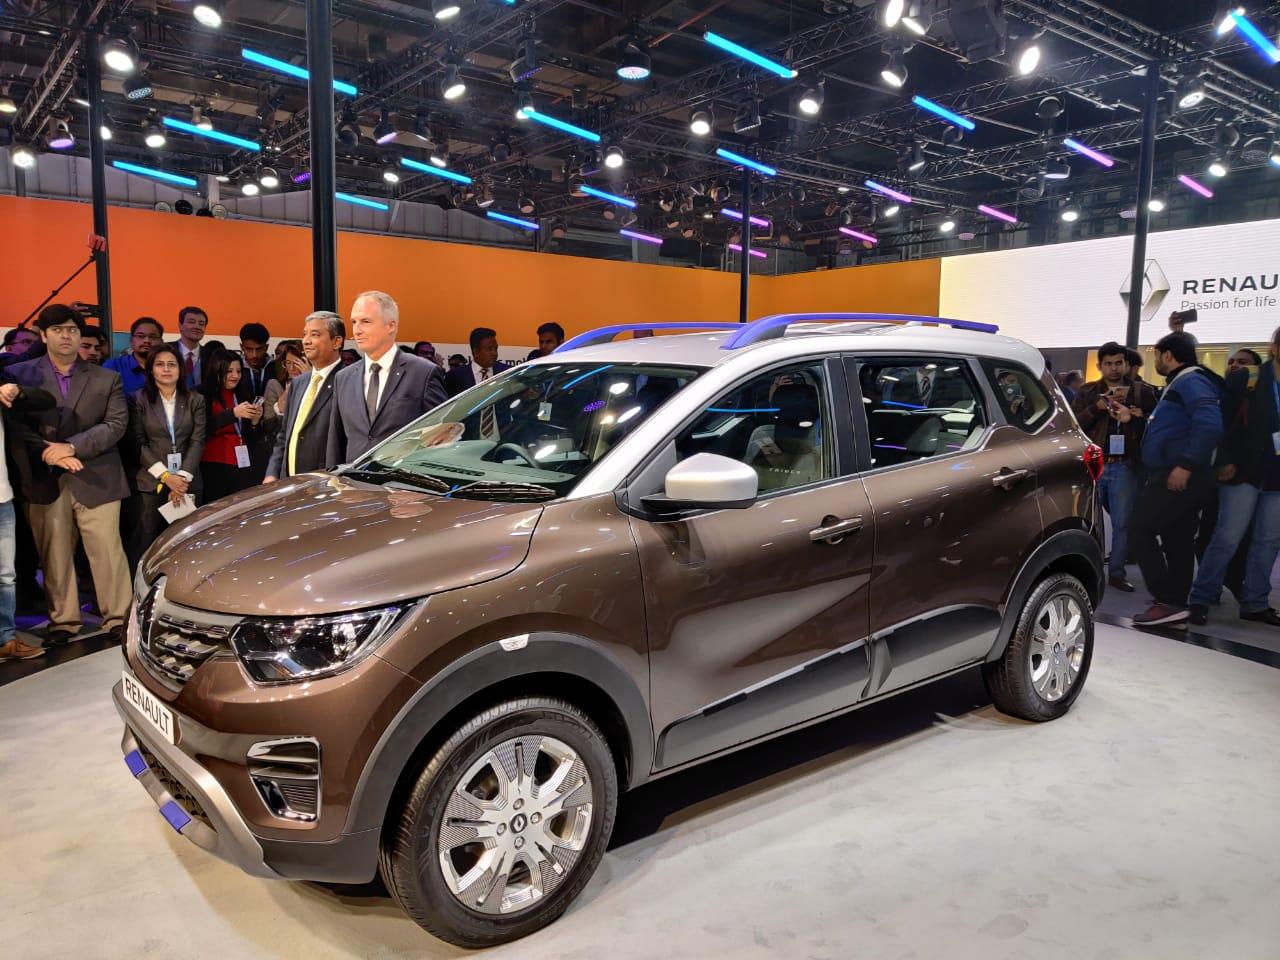 Renault At Auto Expo 2020 Triber Amt Variant Revealed In India To Rival Maruti Suzuki Ertiga Zigwheels